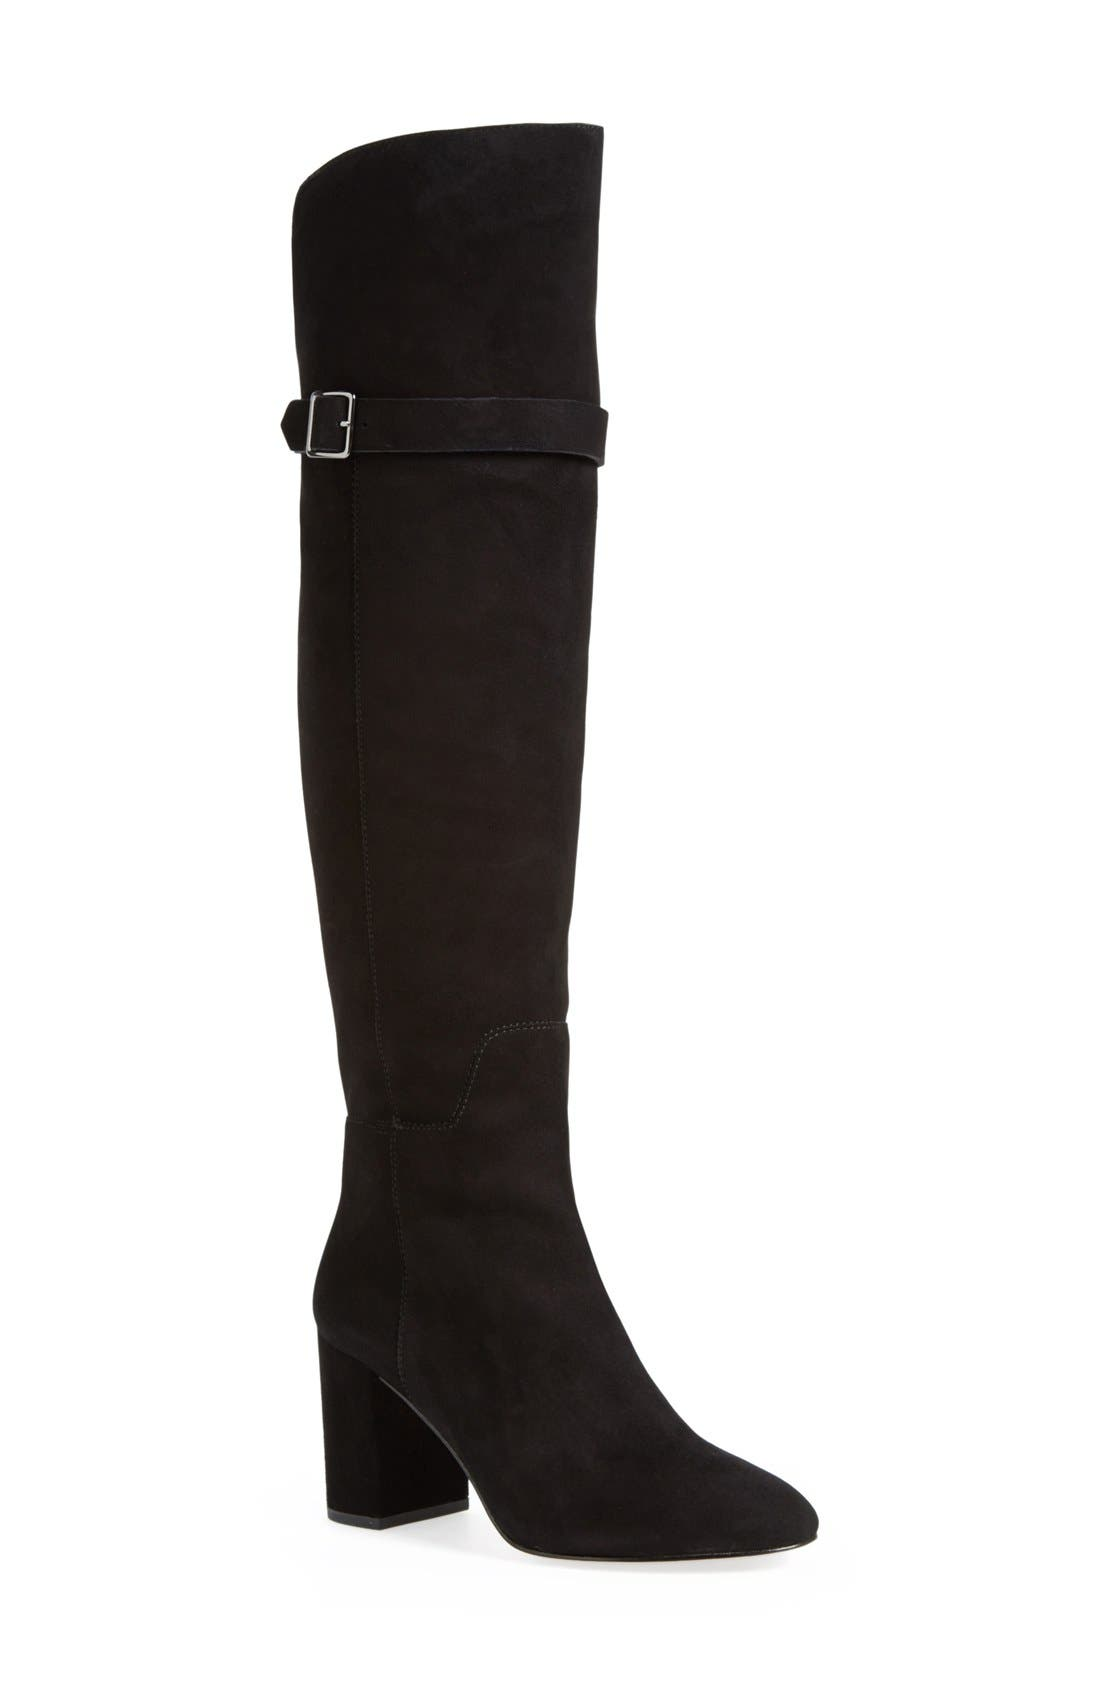 Main Image - Pour la Victoire'Dania' Over the Knee Boot (Women)